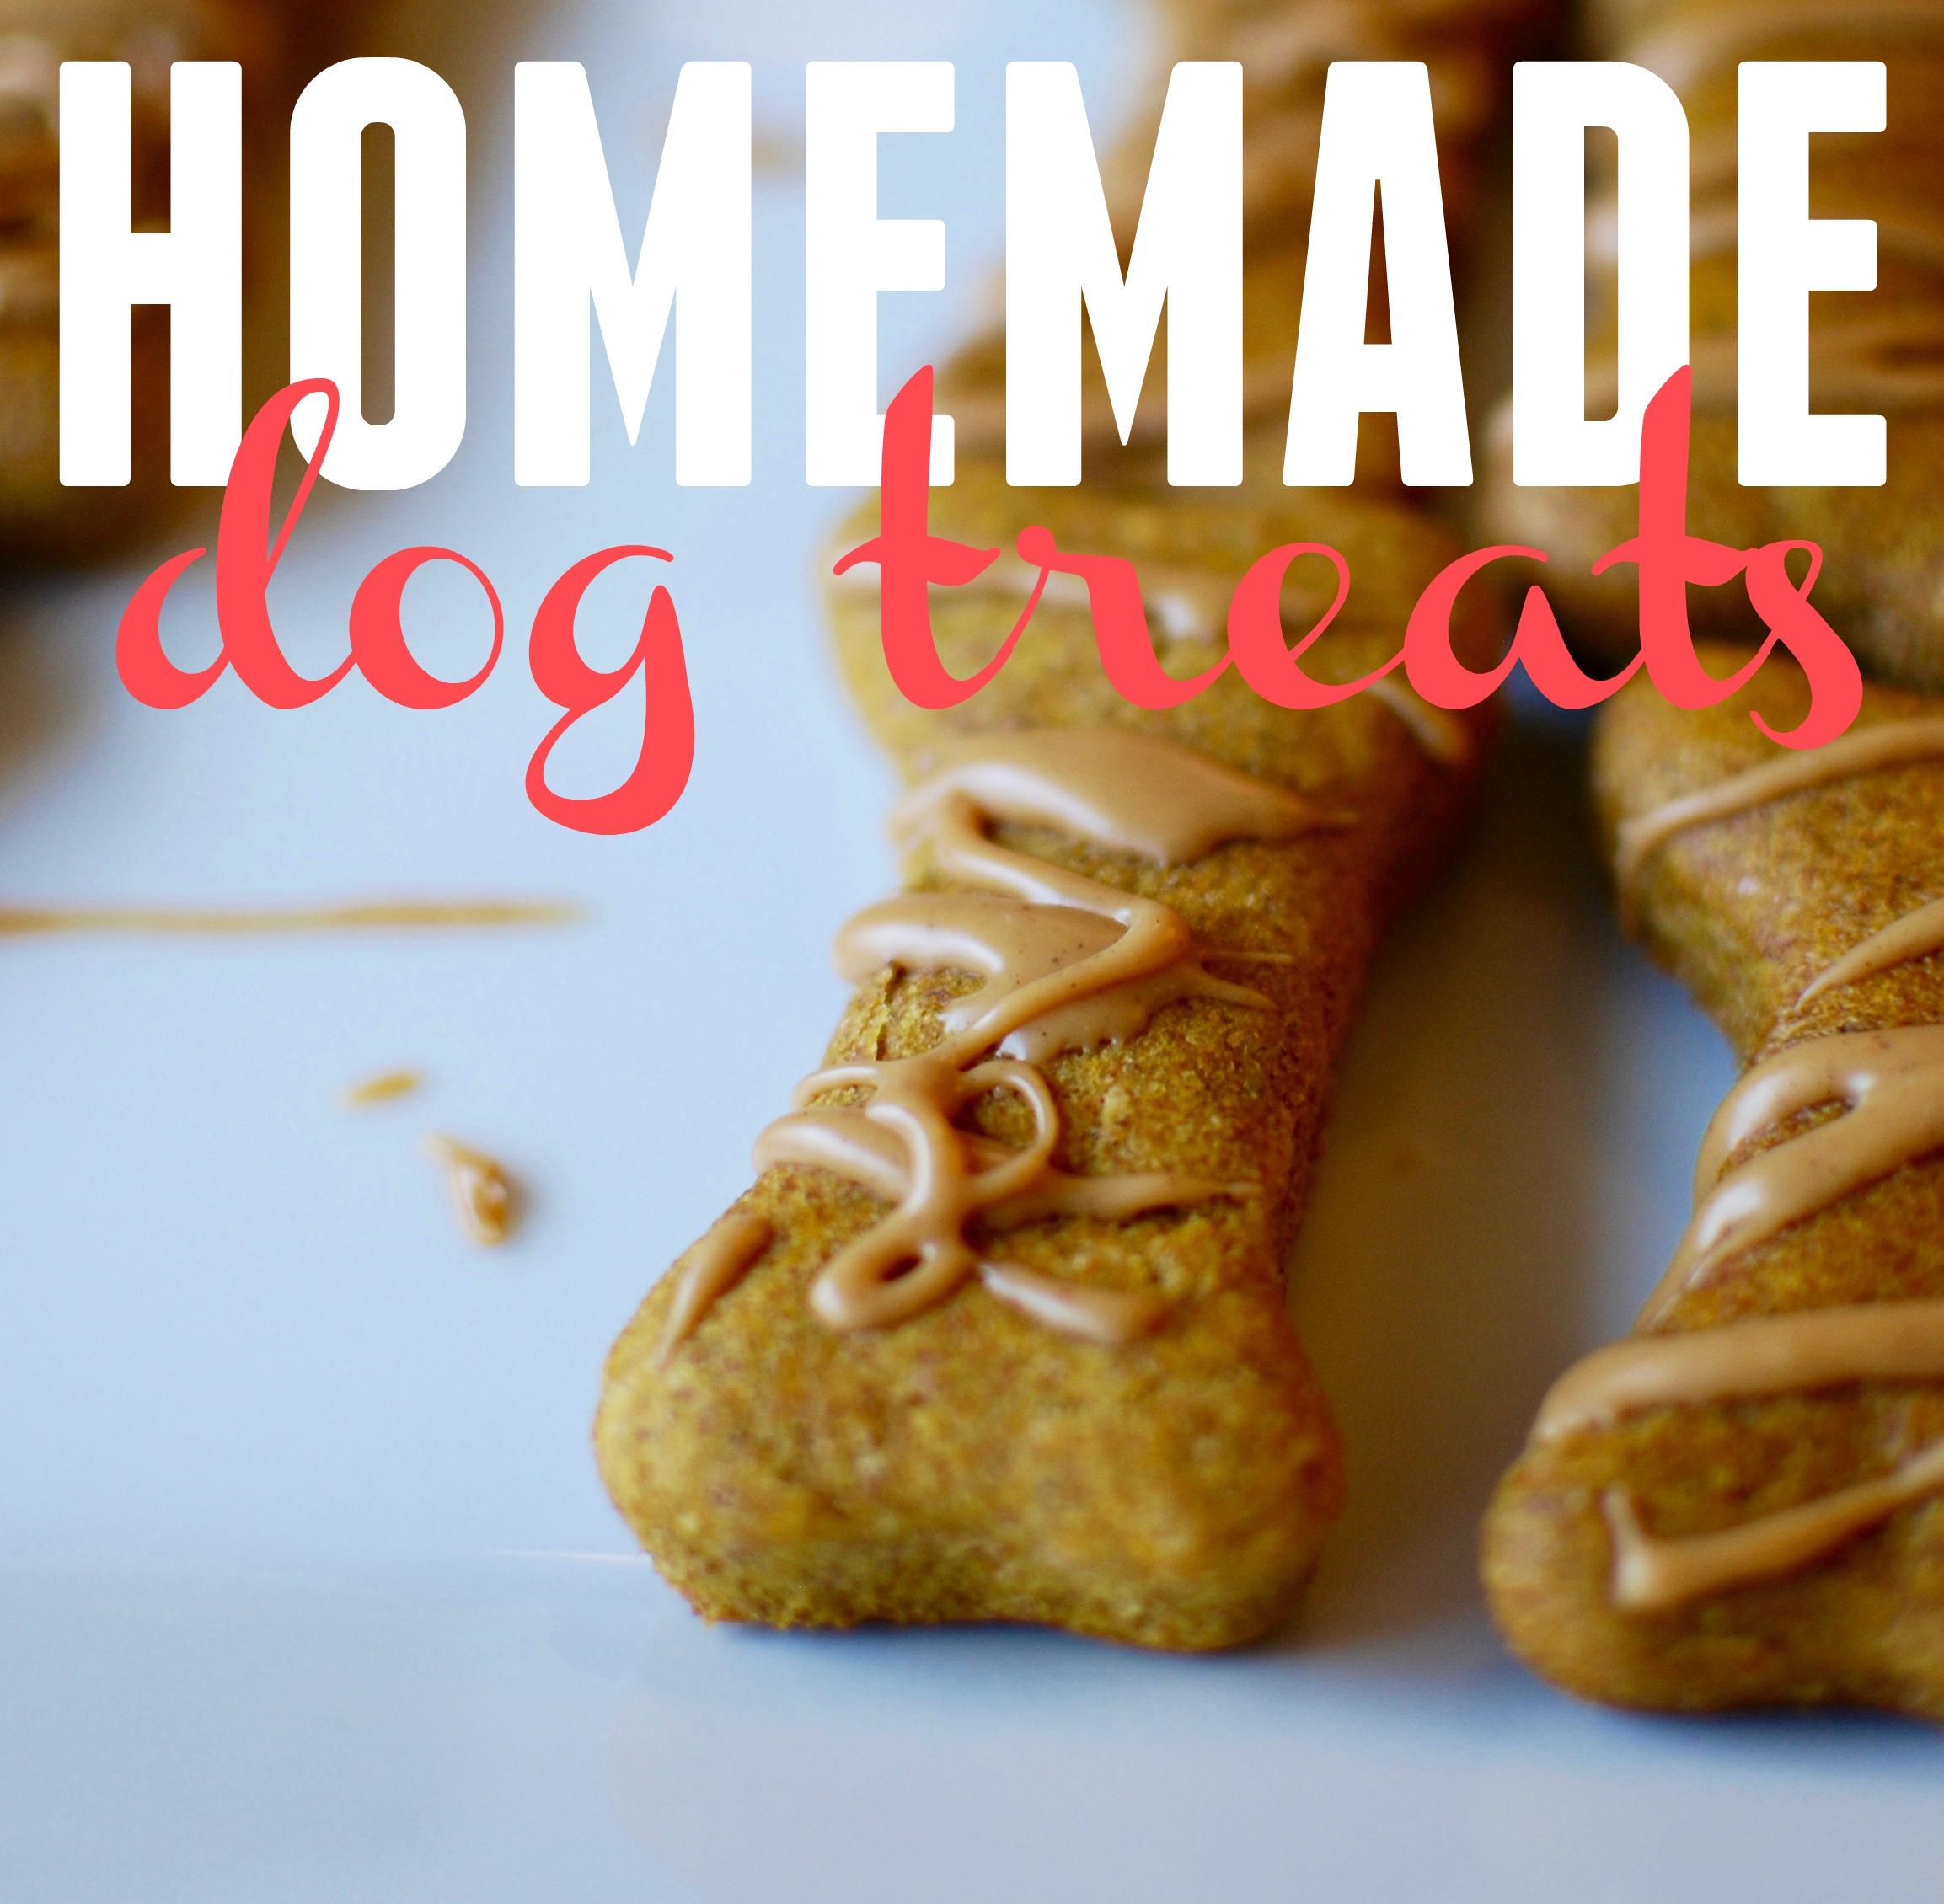 homemade-dog-treats_close-up_pin.jpg